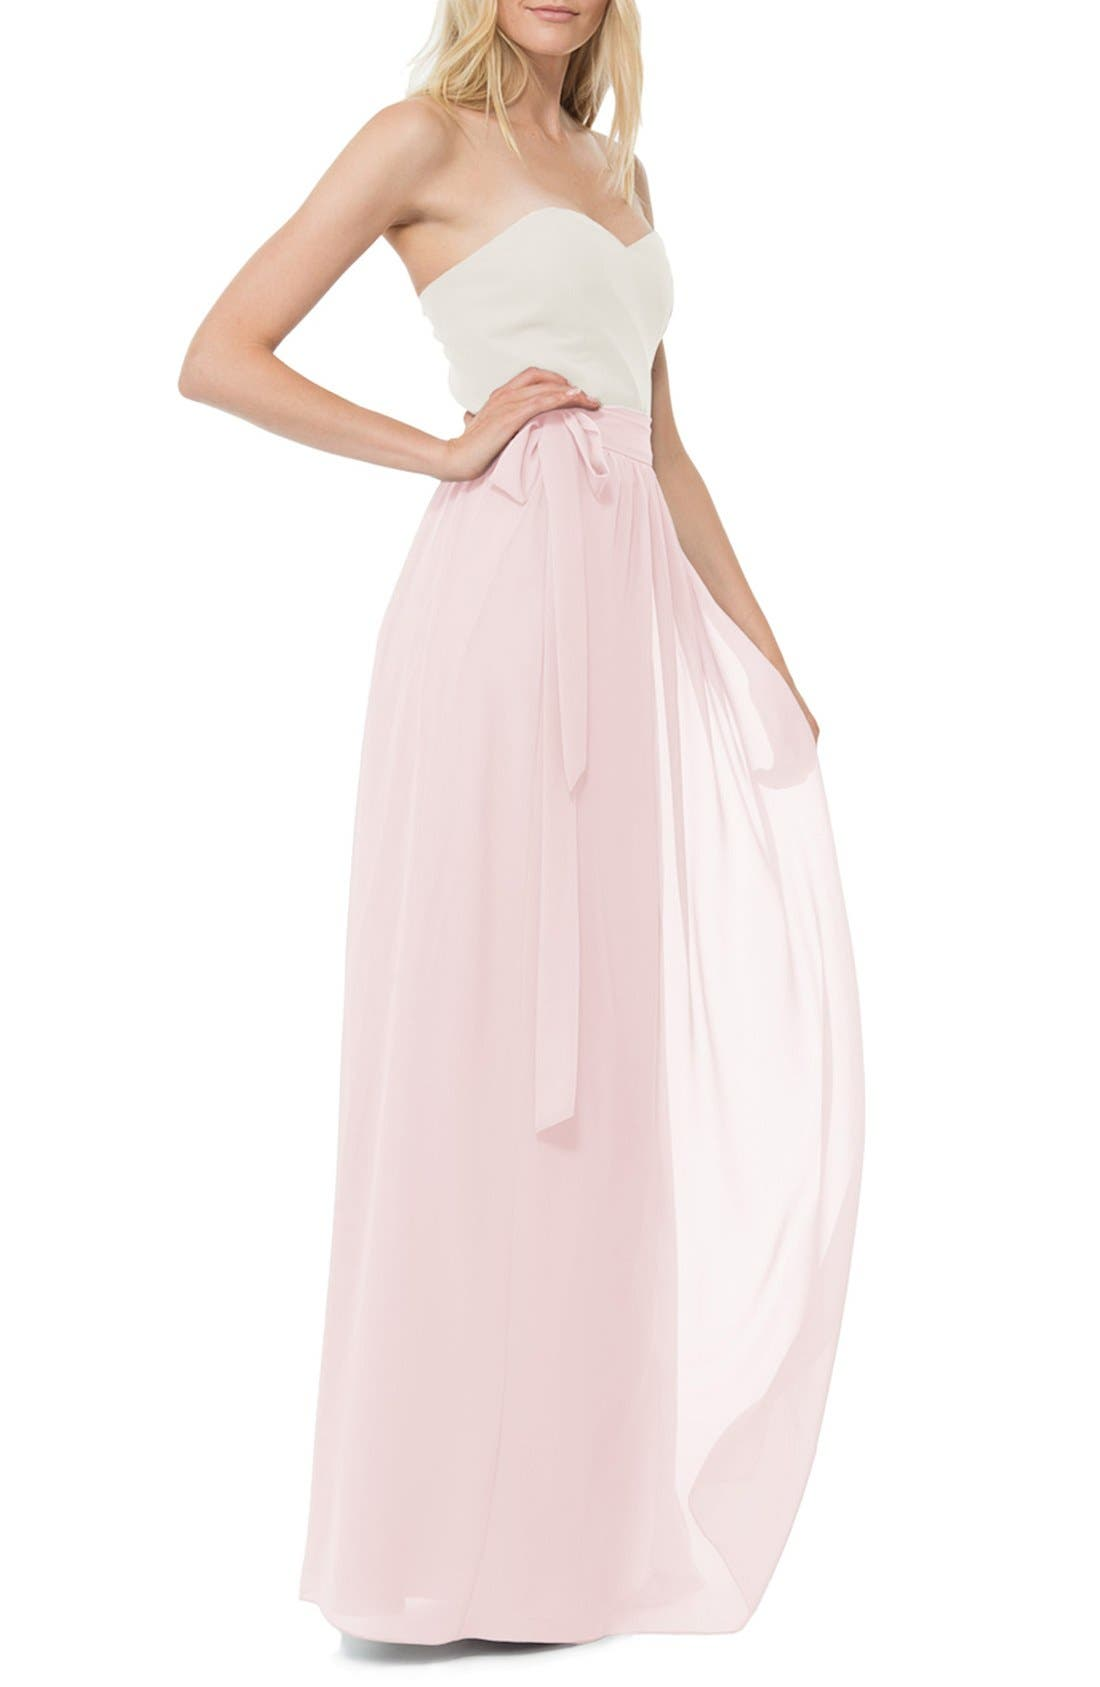 Whitney Chiffon Wrap Maxi Skirt,                             Main thumbnail 1, color,                             680